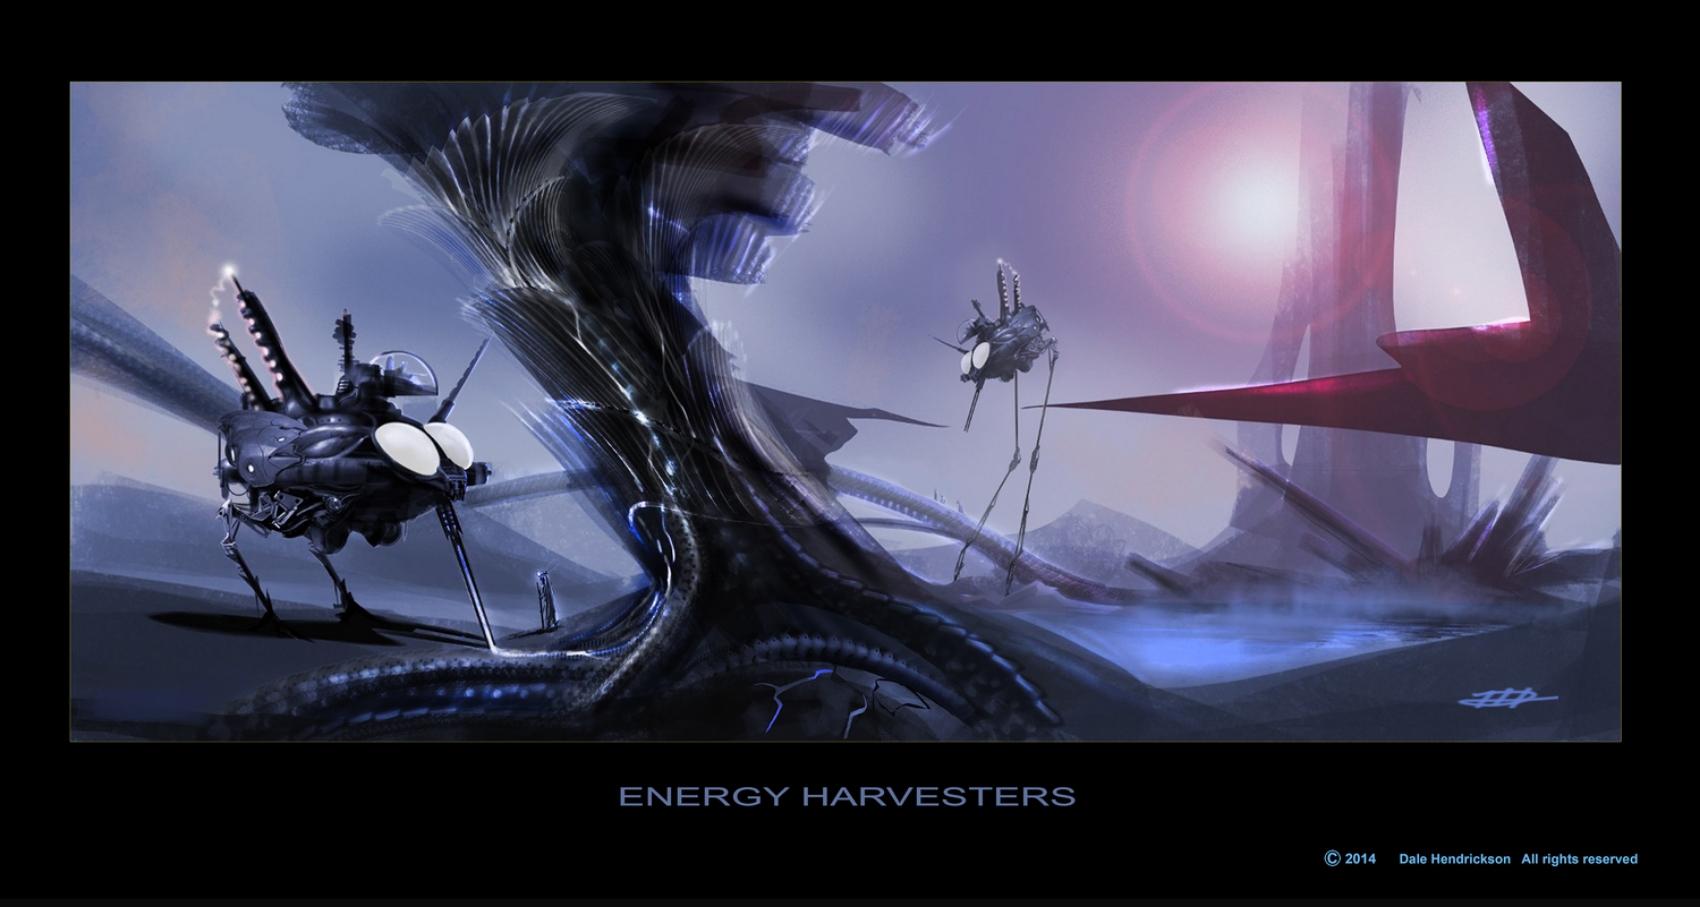 ENERGY HARVESTERS